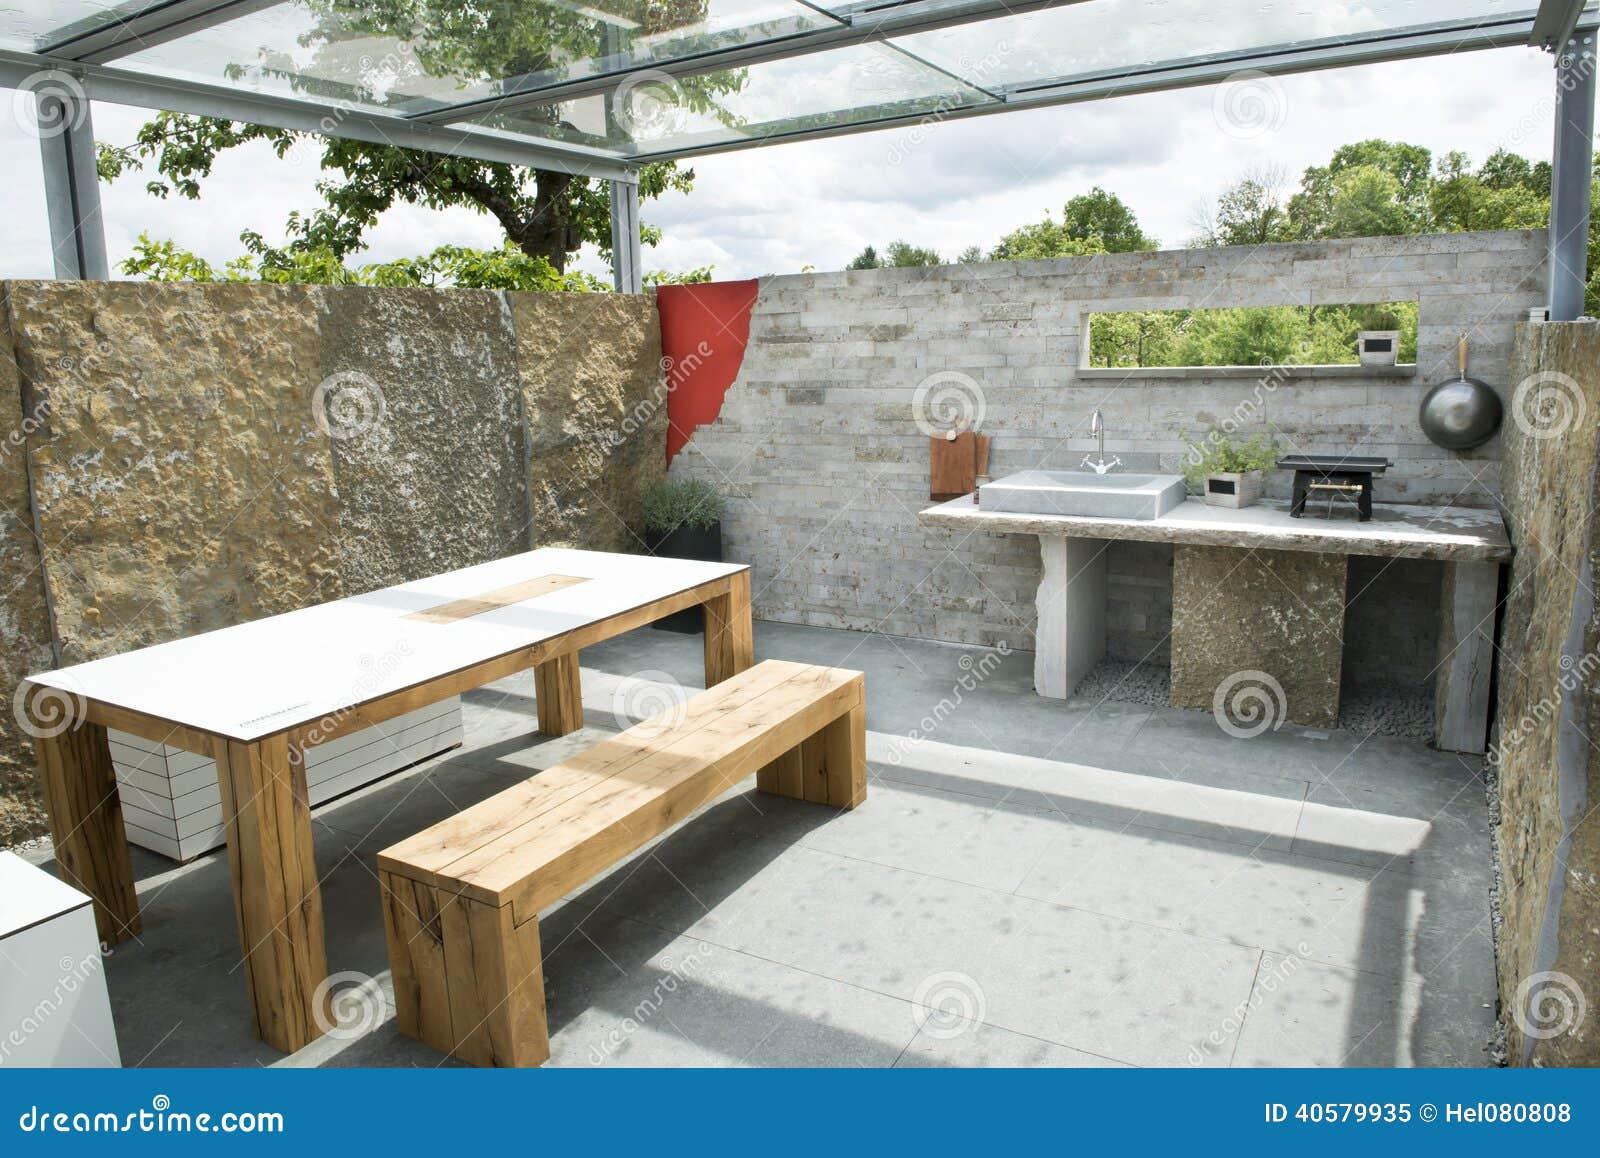 Cucina esterna immagine stock immagine di terrazzo sgabelli 40579935 - Cucine esterne da terrazzo ...